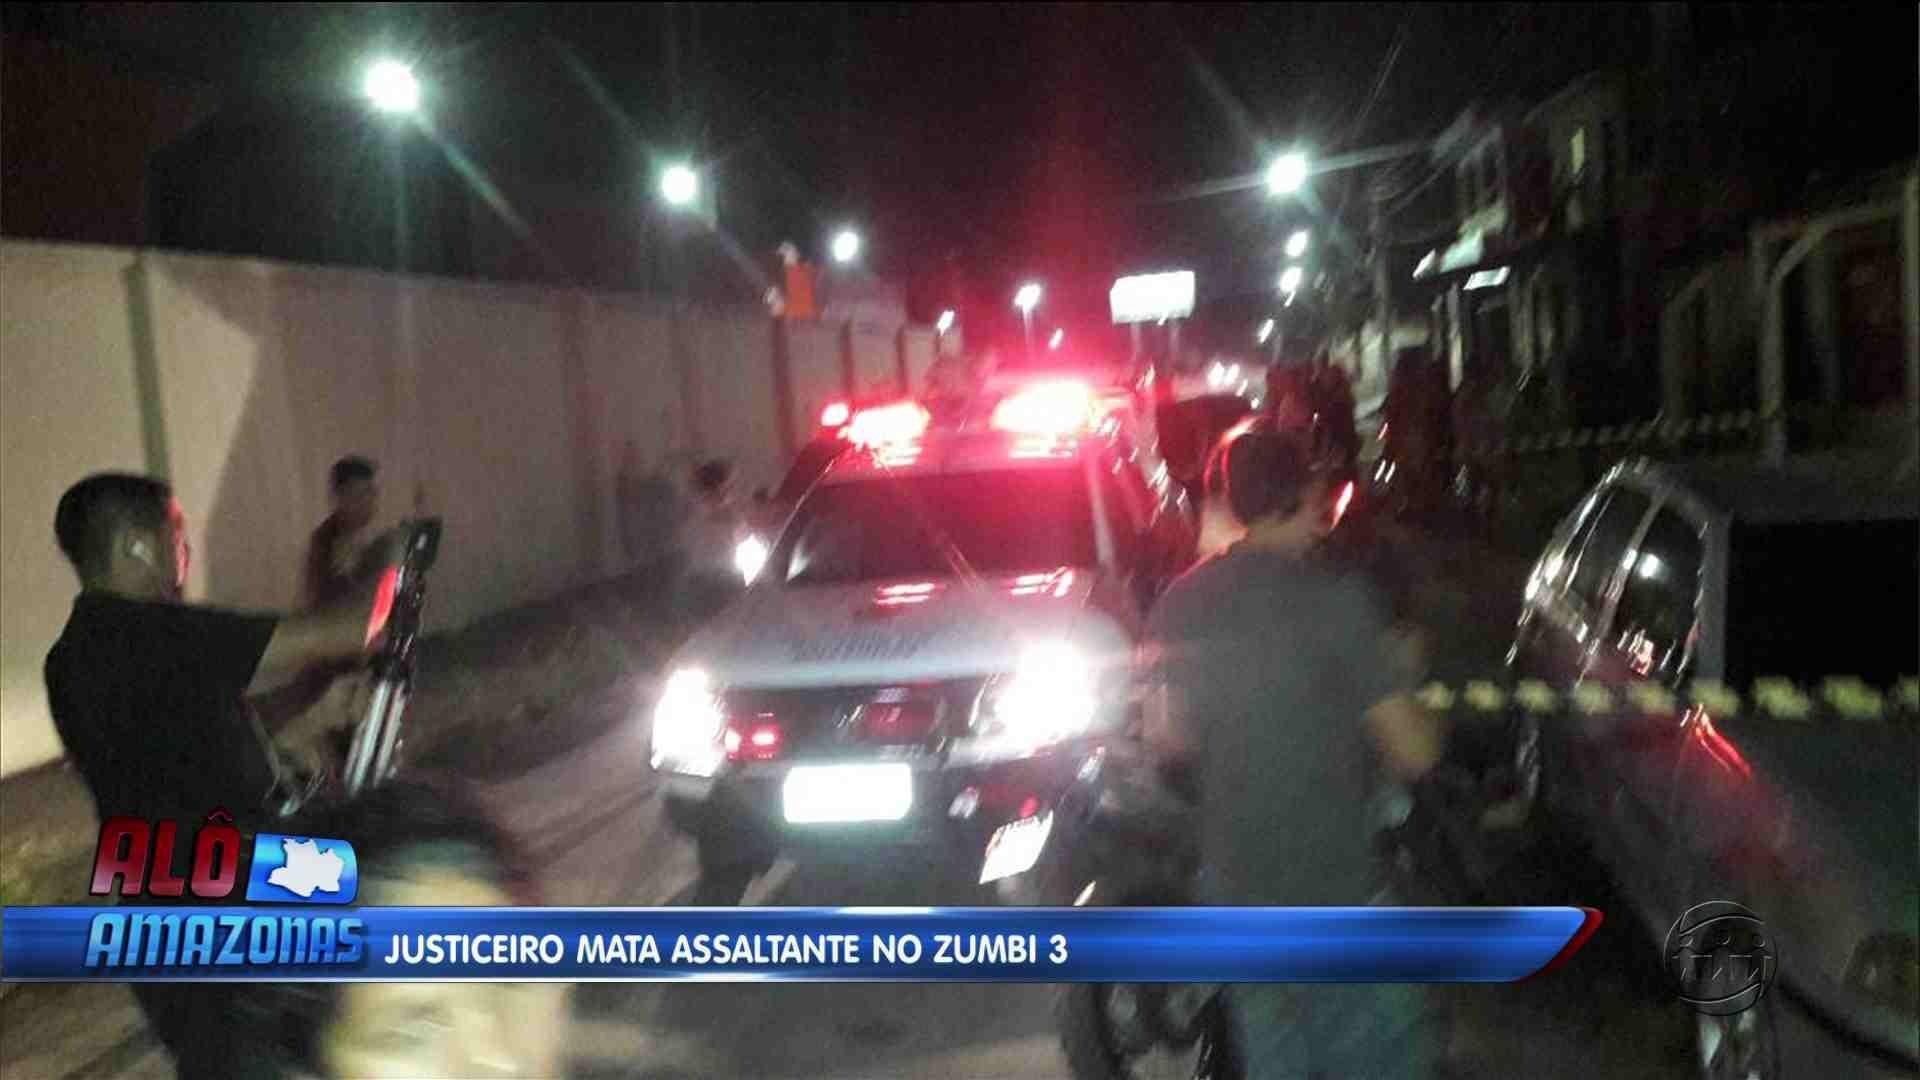 JUSTICEIRO: HOMEM MATA ASSALTANTE NO BAIRRO ZUMBI - Alô Amazonas 14/12/17